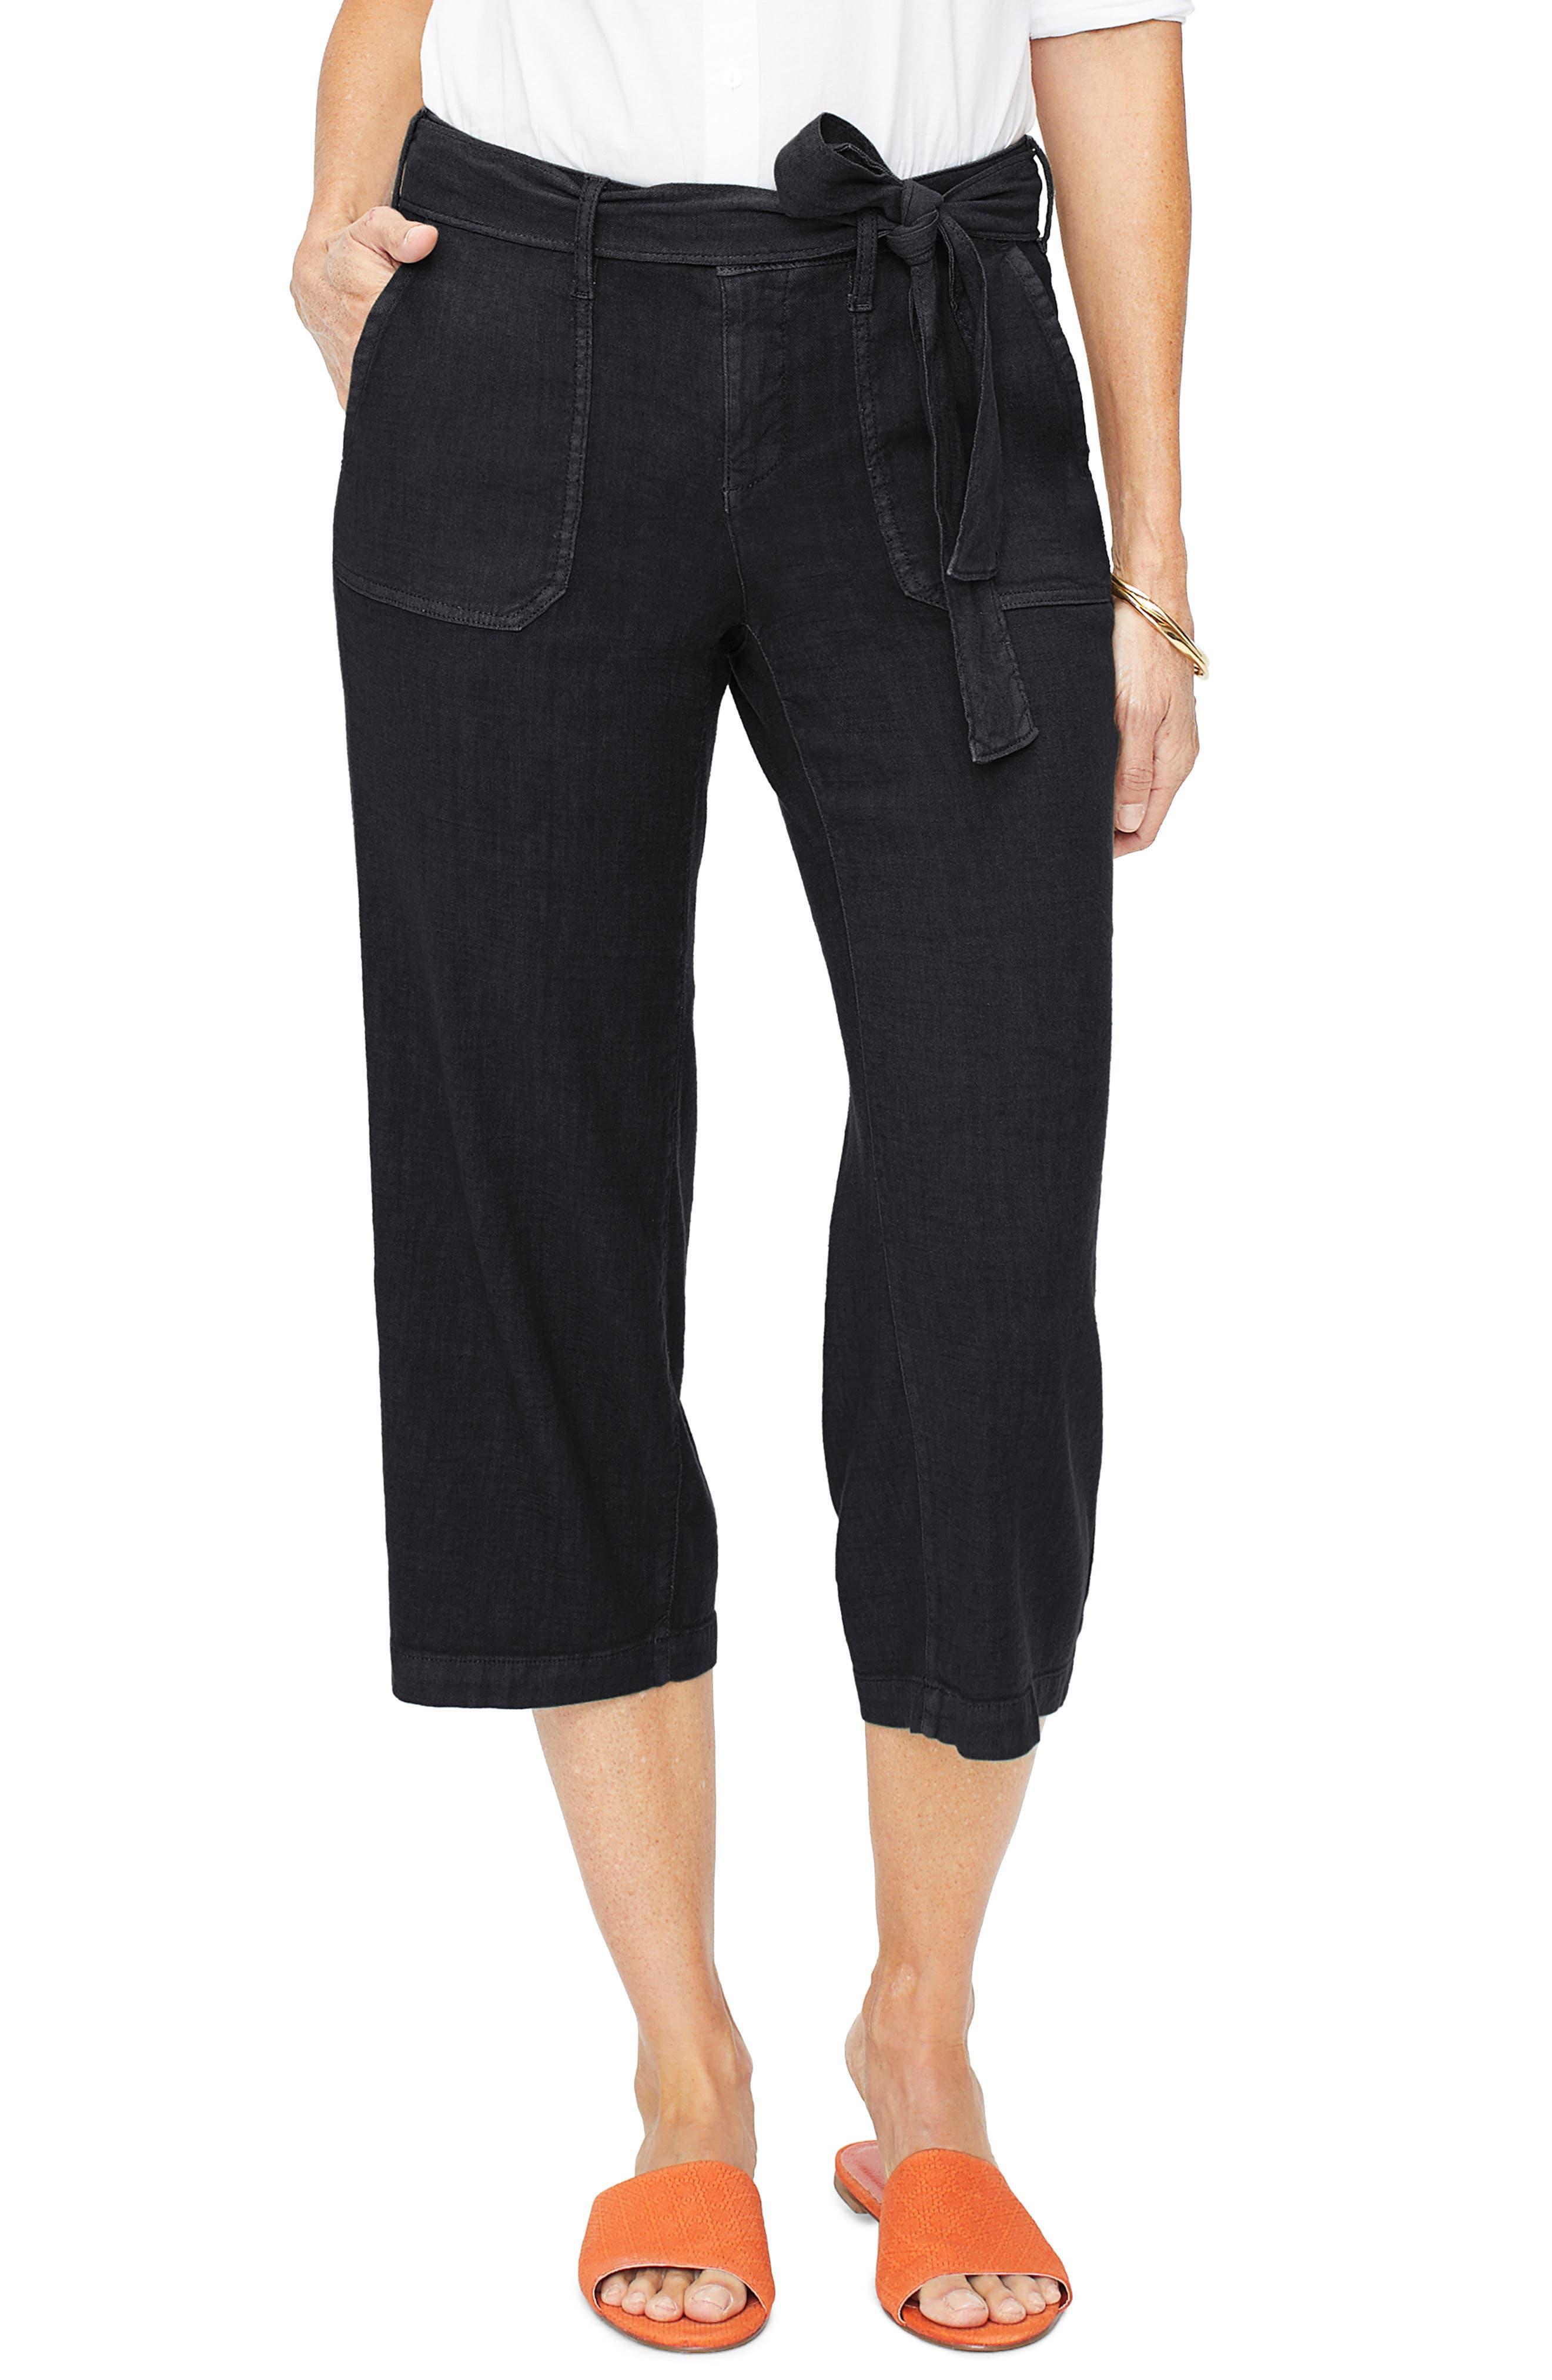 Nydj Fashion Cargo Capri Pants, Black